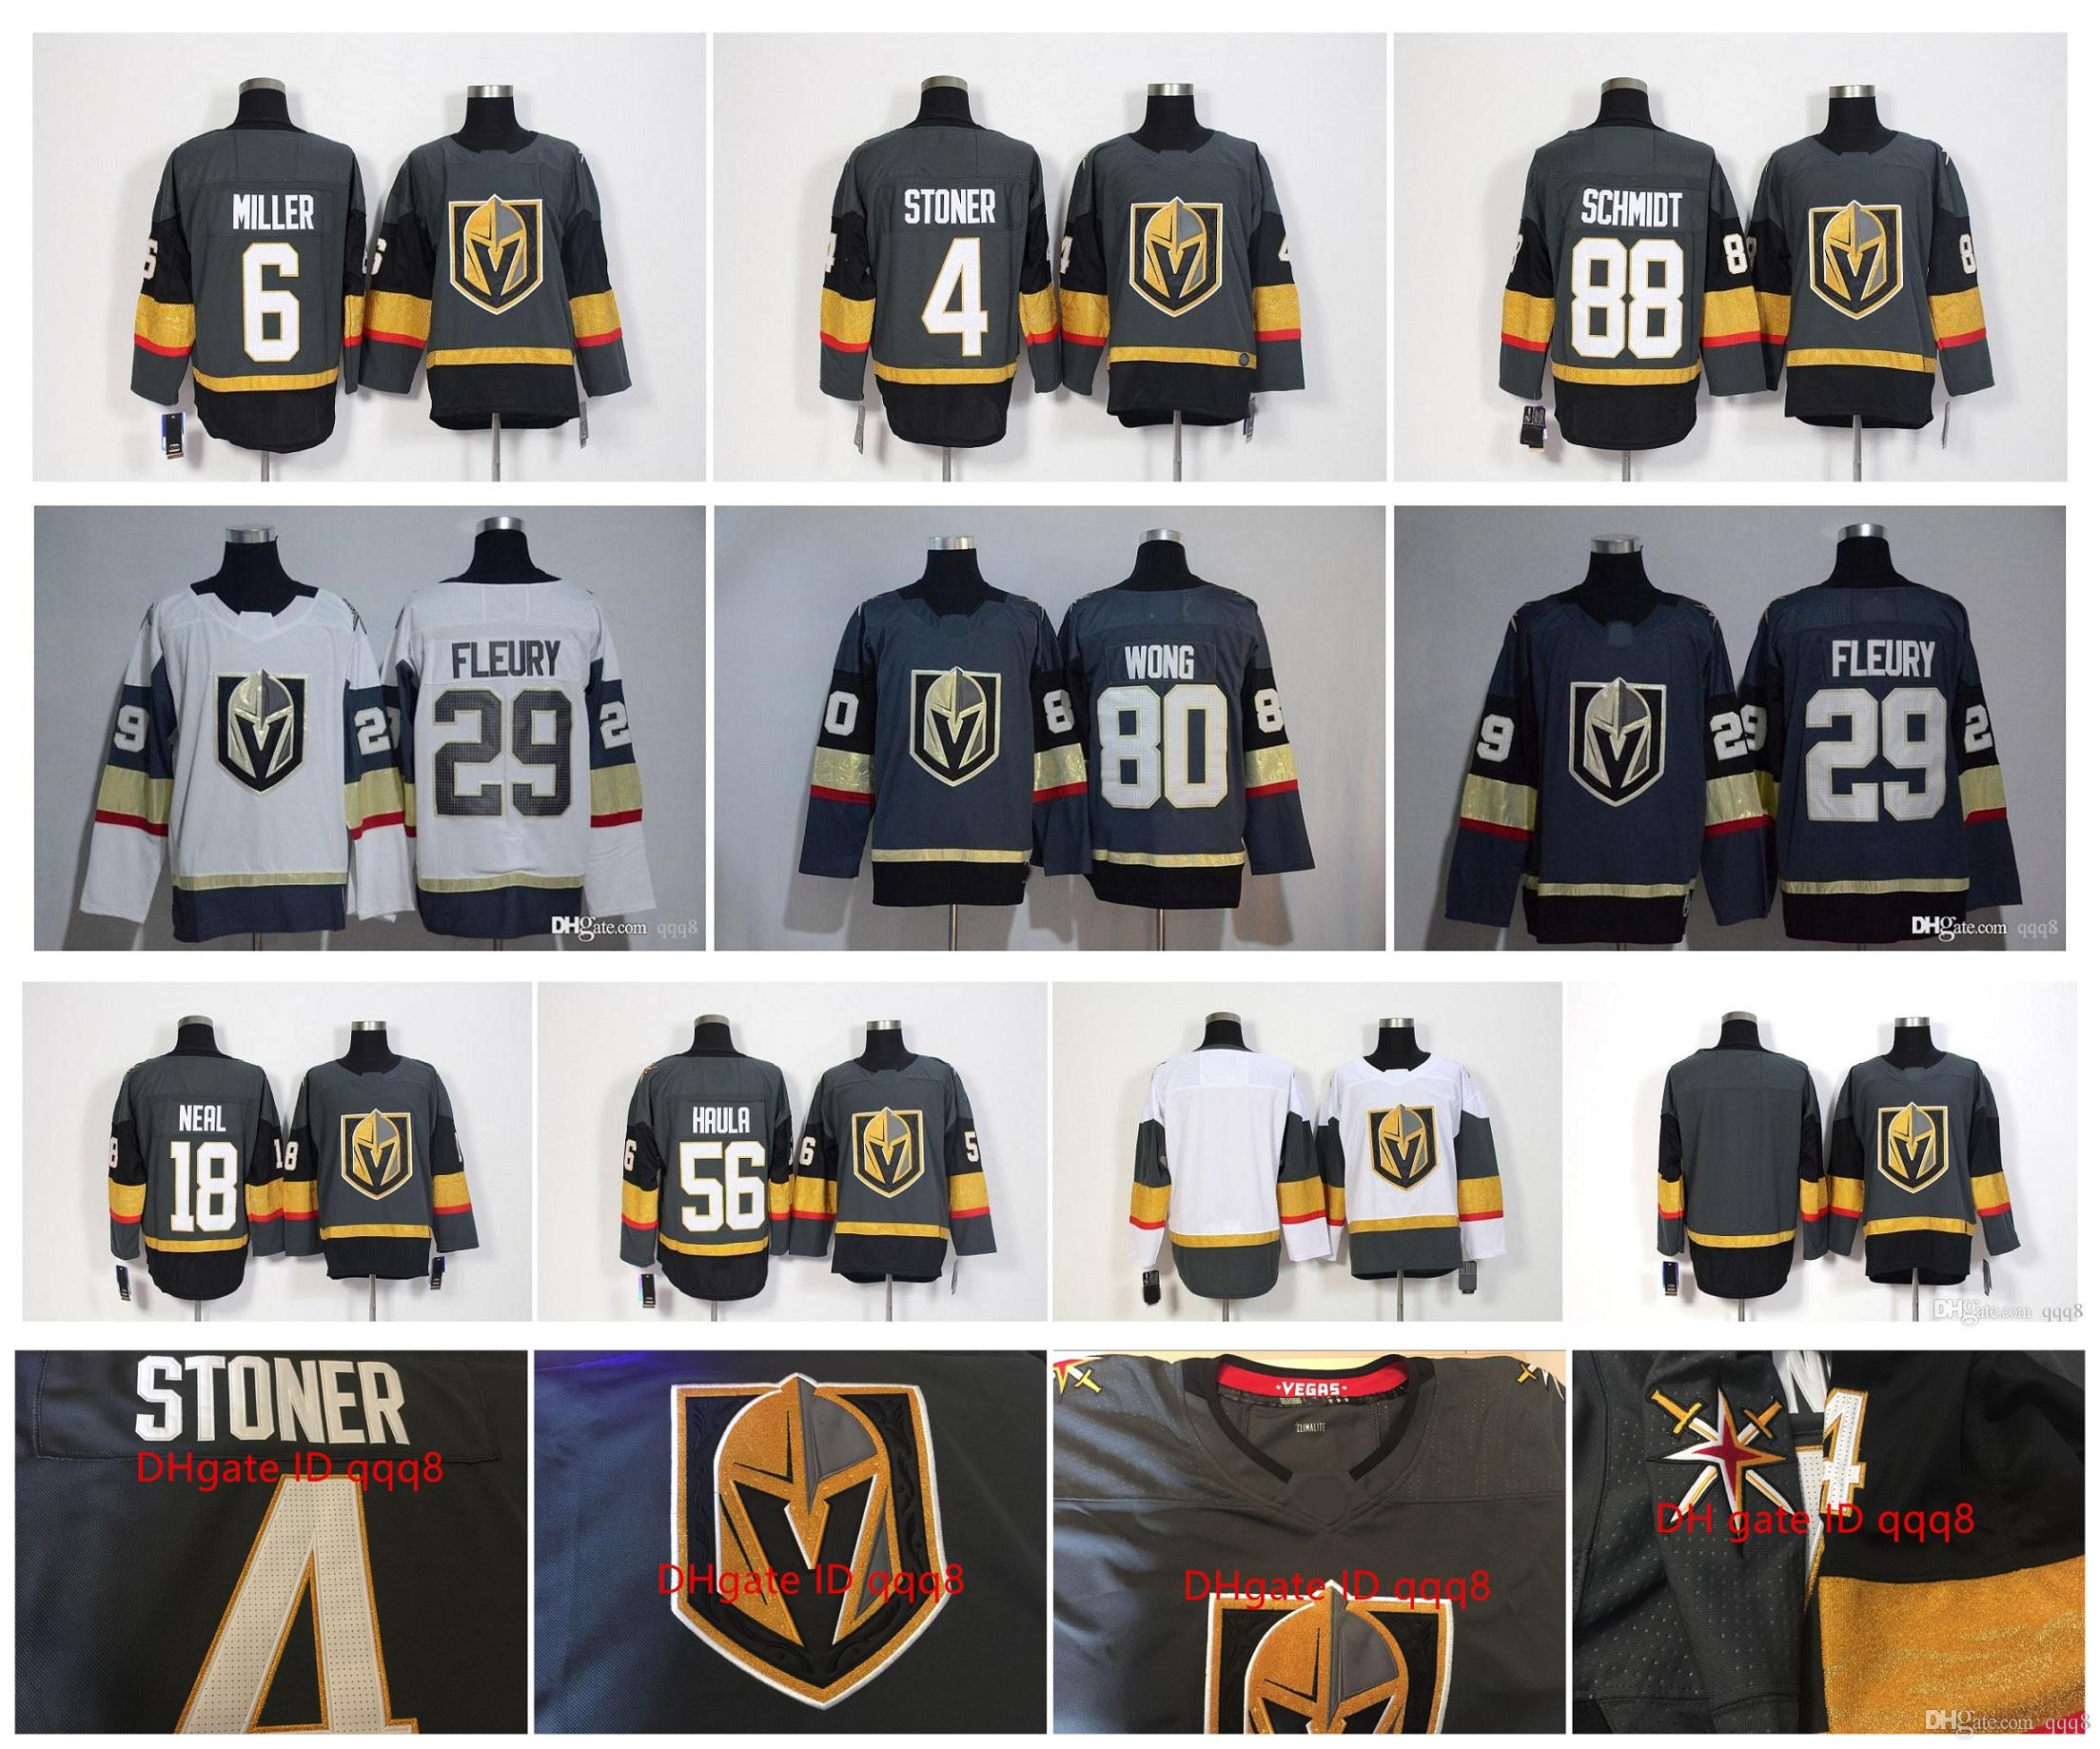 7d6603584 2019 VGK Vegas Golden Knights Jersey 29 Marc Andre Fleury 71 Karlsson 57  Perron 56 Haula 88 Nate Schmidt 18 James Neal 4 Stoner 6 Miller Hockey From  Qqq8, ...